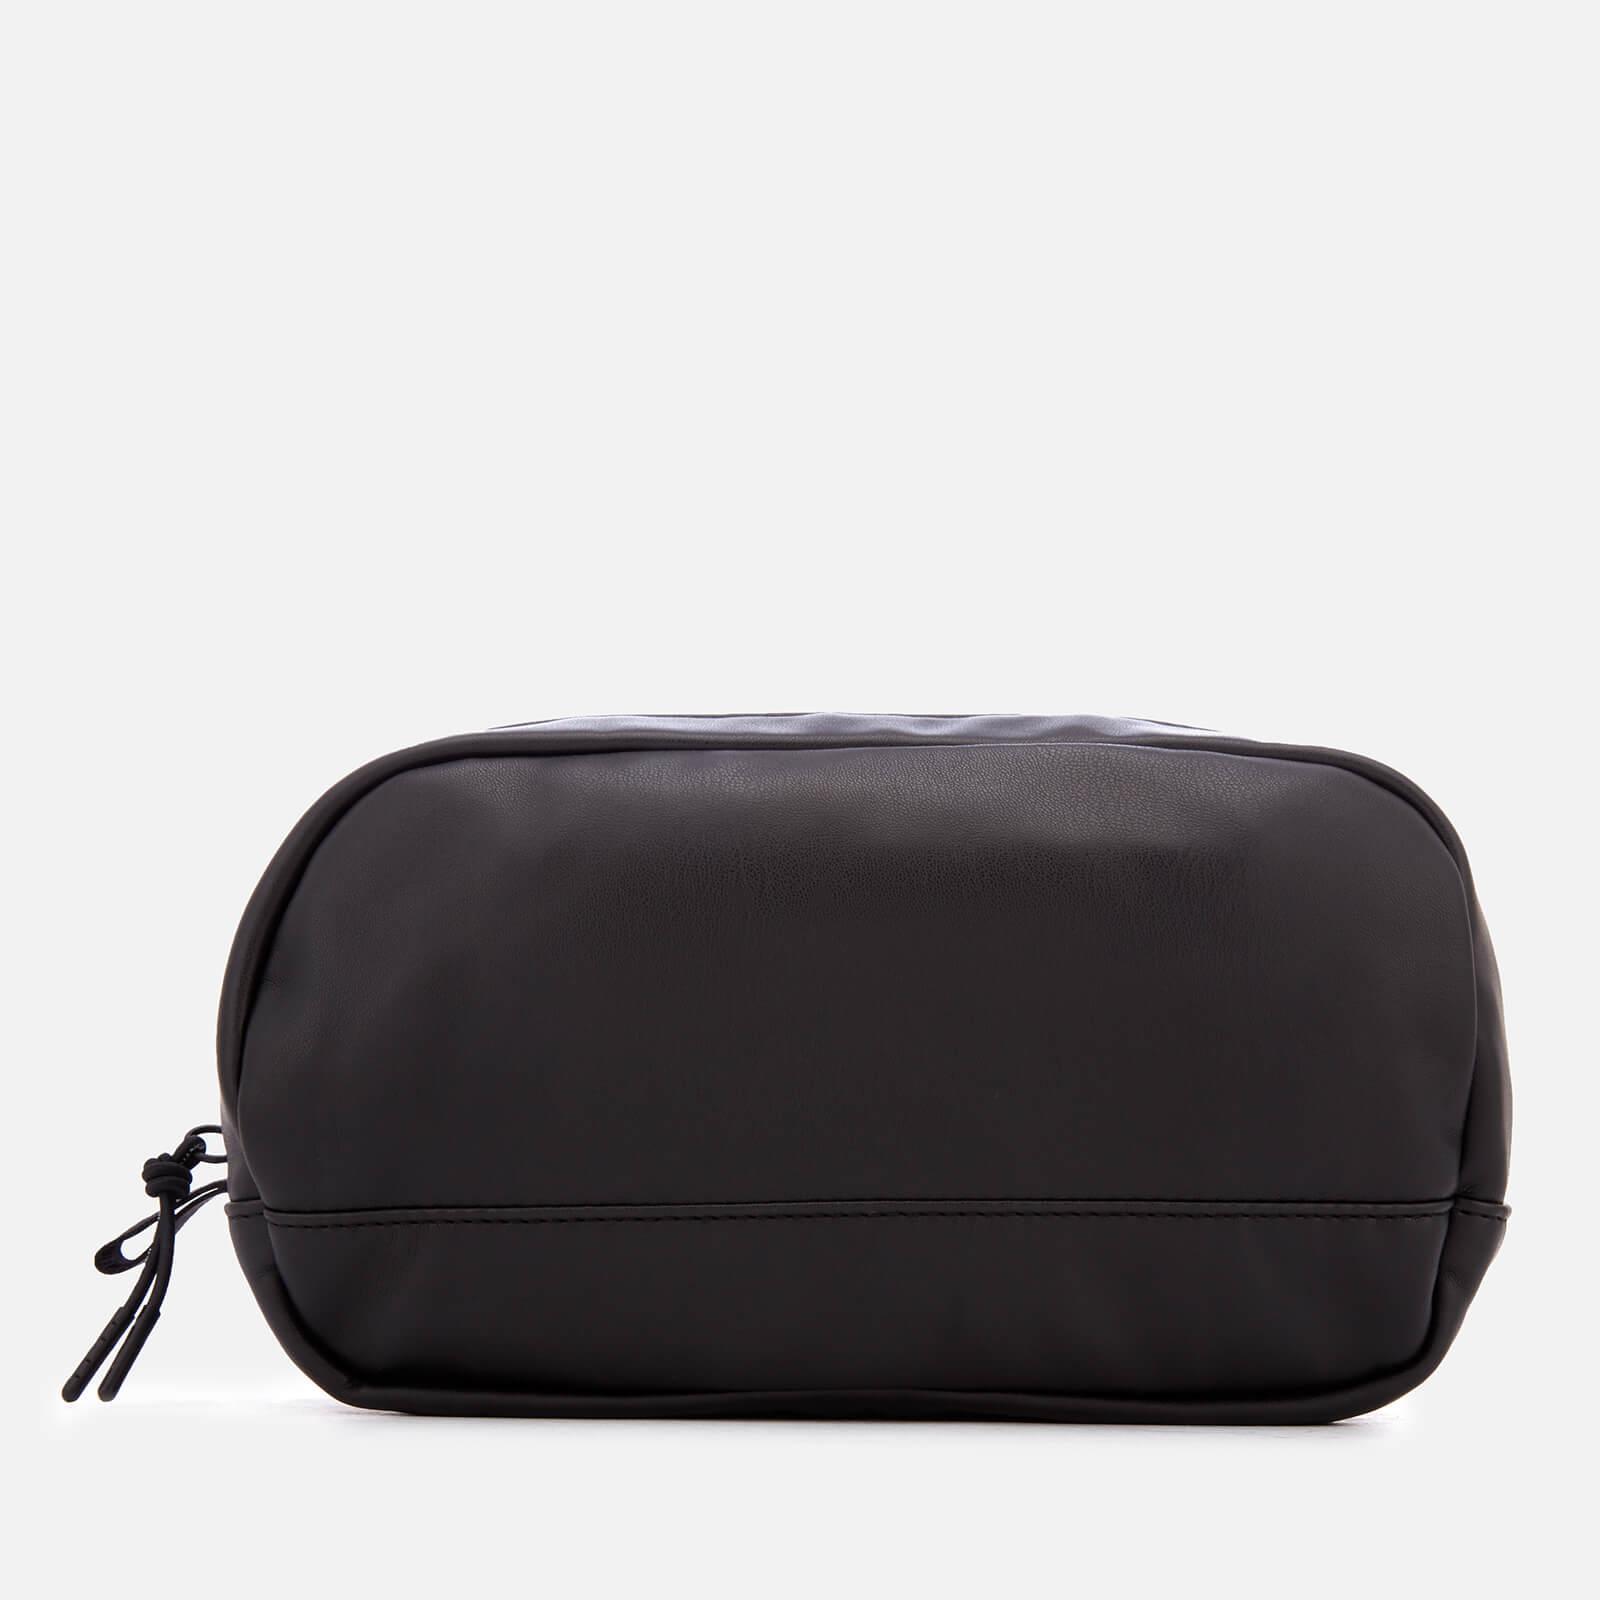 e3f16ea6c14b Armani Exchange - Black Pu Wash Bag for Men - Lyst. View fullscreen